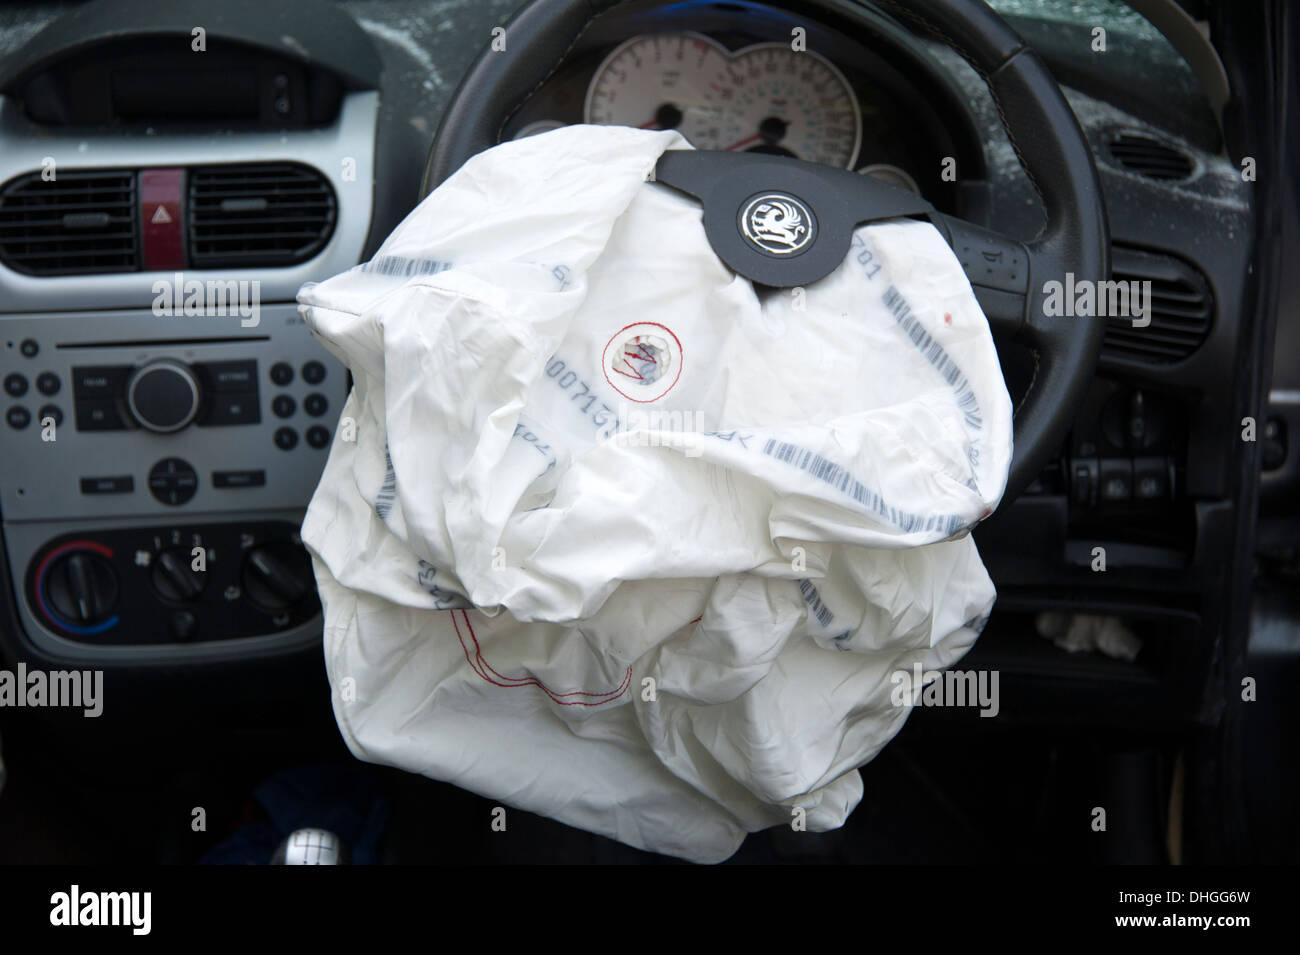 deployed airbag photos deployed airbag images alamy. Black Bedroom Furniture Sets. Home Design Ideas